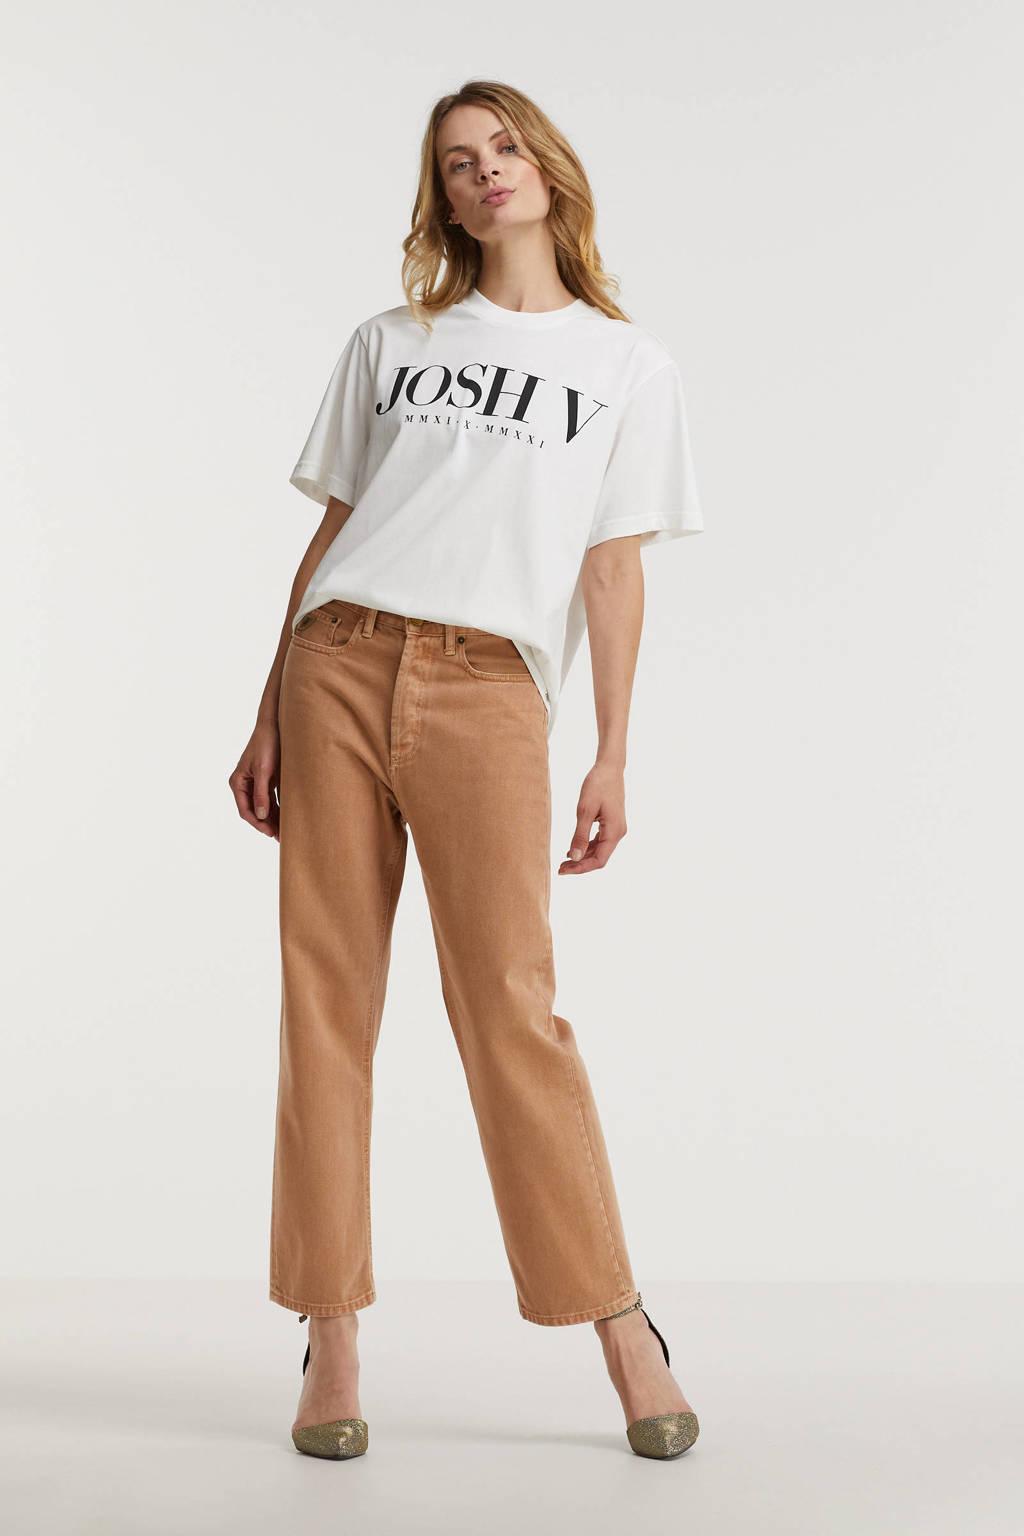 JOSH V T-shirt Teddy Anniversary met logo gebroken wit, Gebroken wit